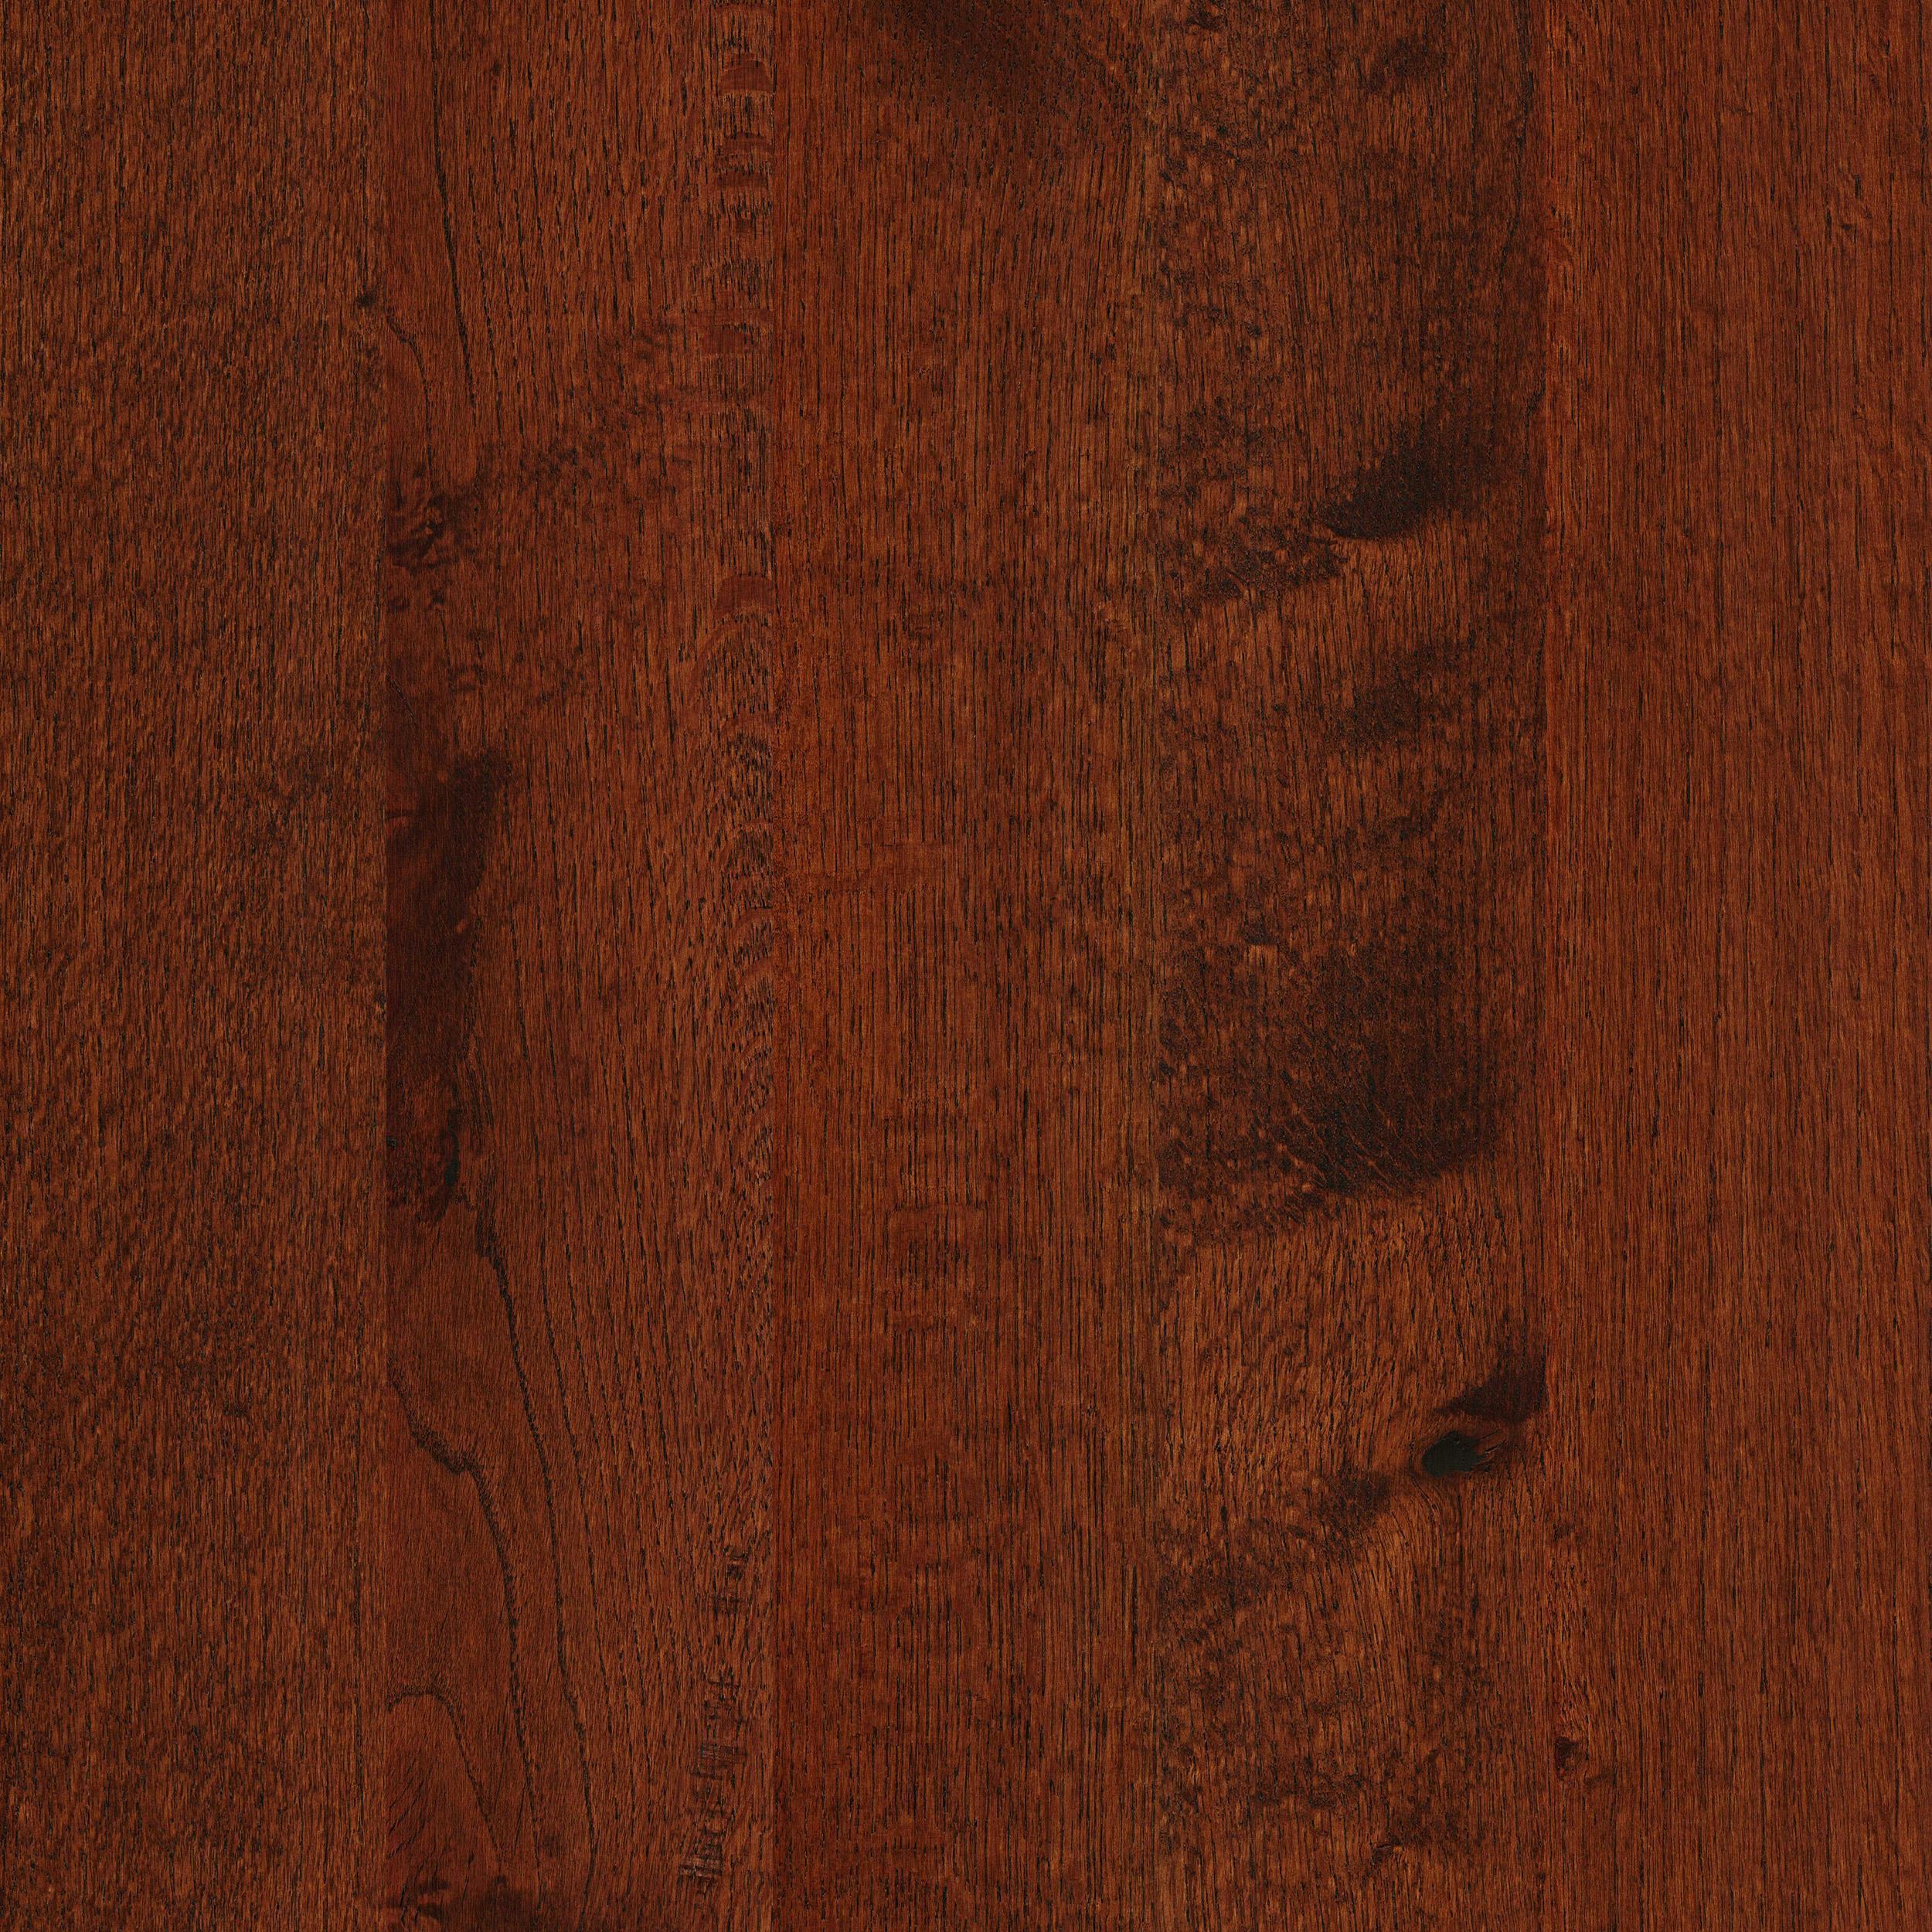 hardwood flooring labor cost of timber hardwood red oak sorrell 5 wide solid hardwood flooring in red oak sorrell timber solid approved bk